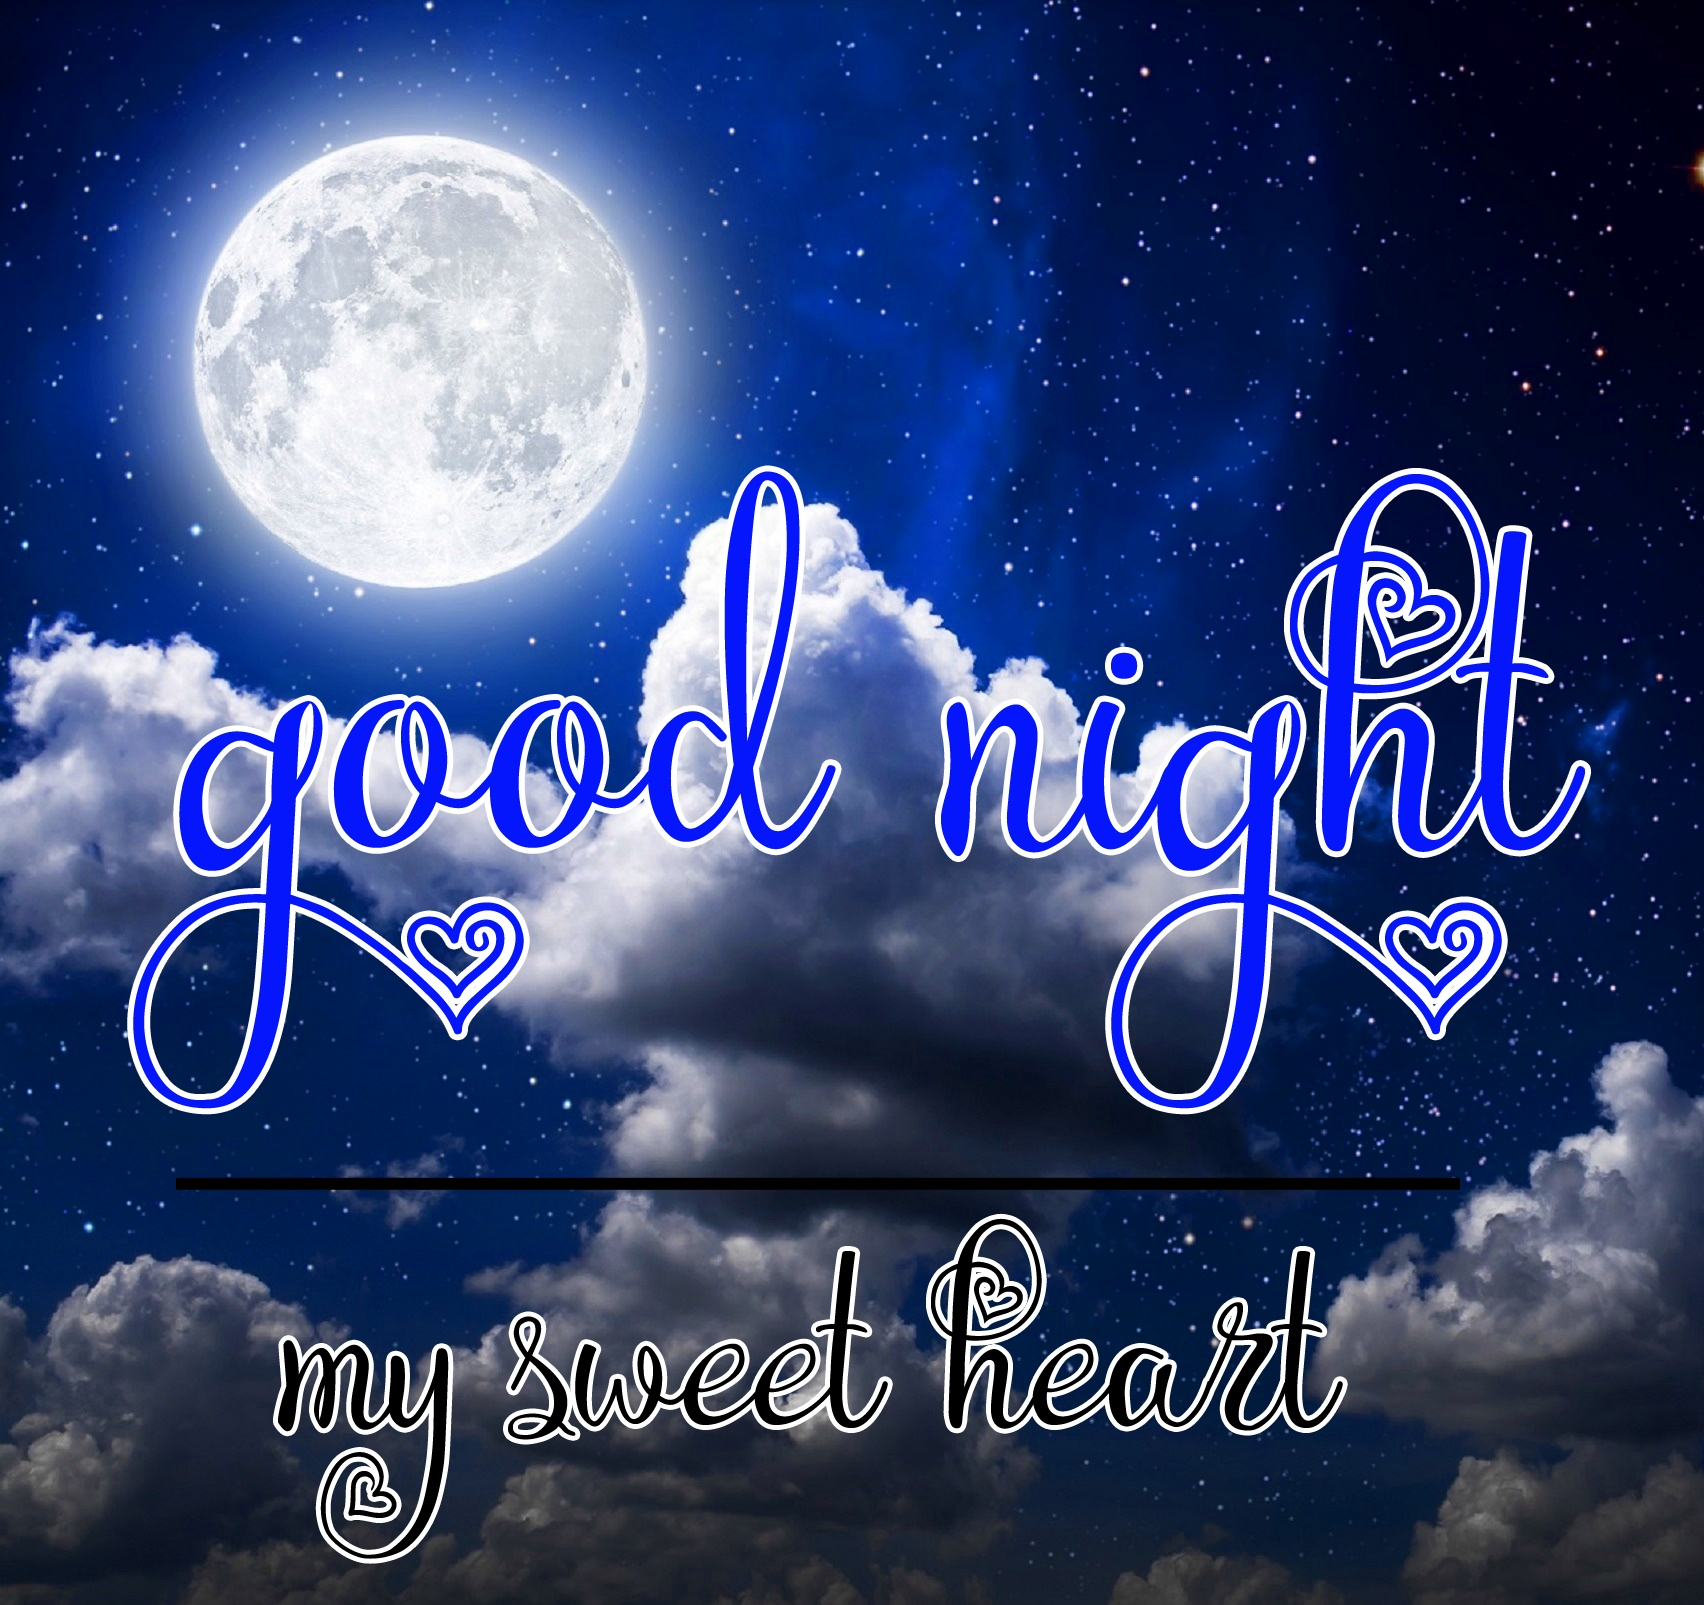 Free good night Images 79